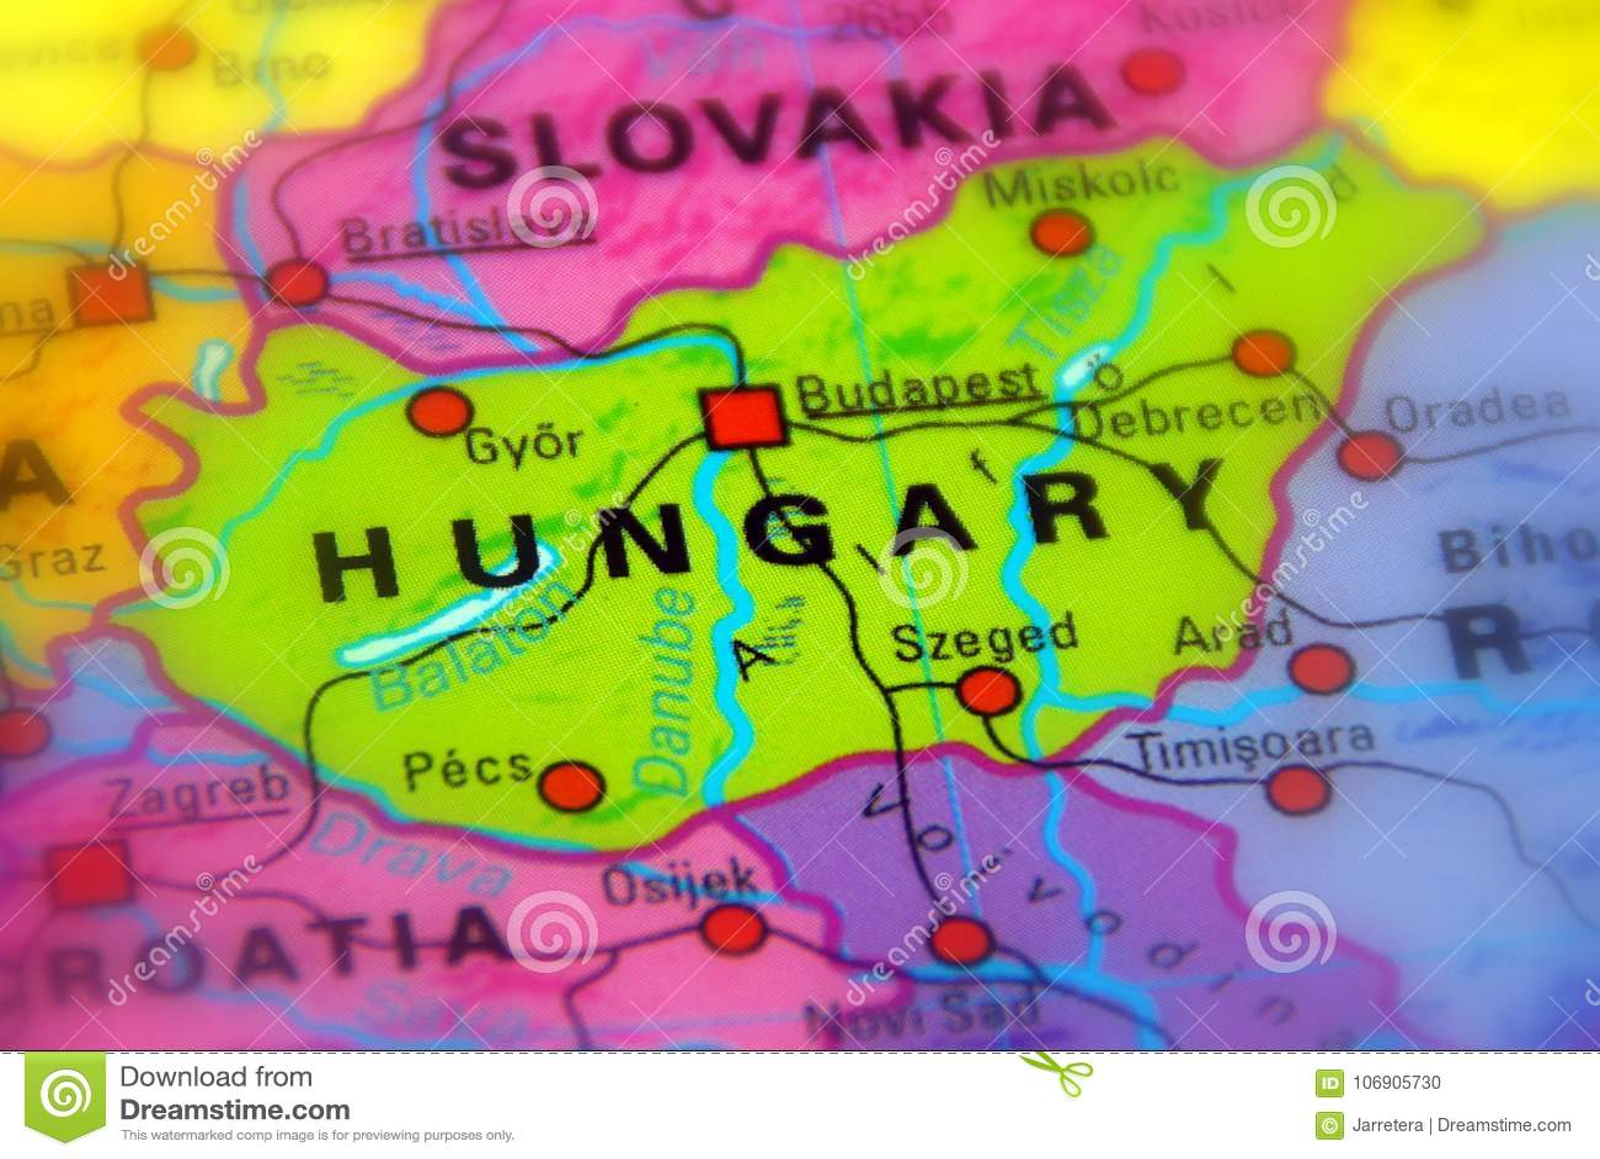 Węgry, Europa -